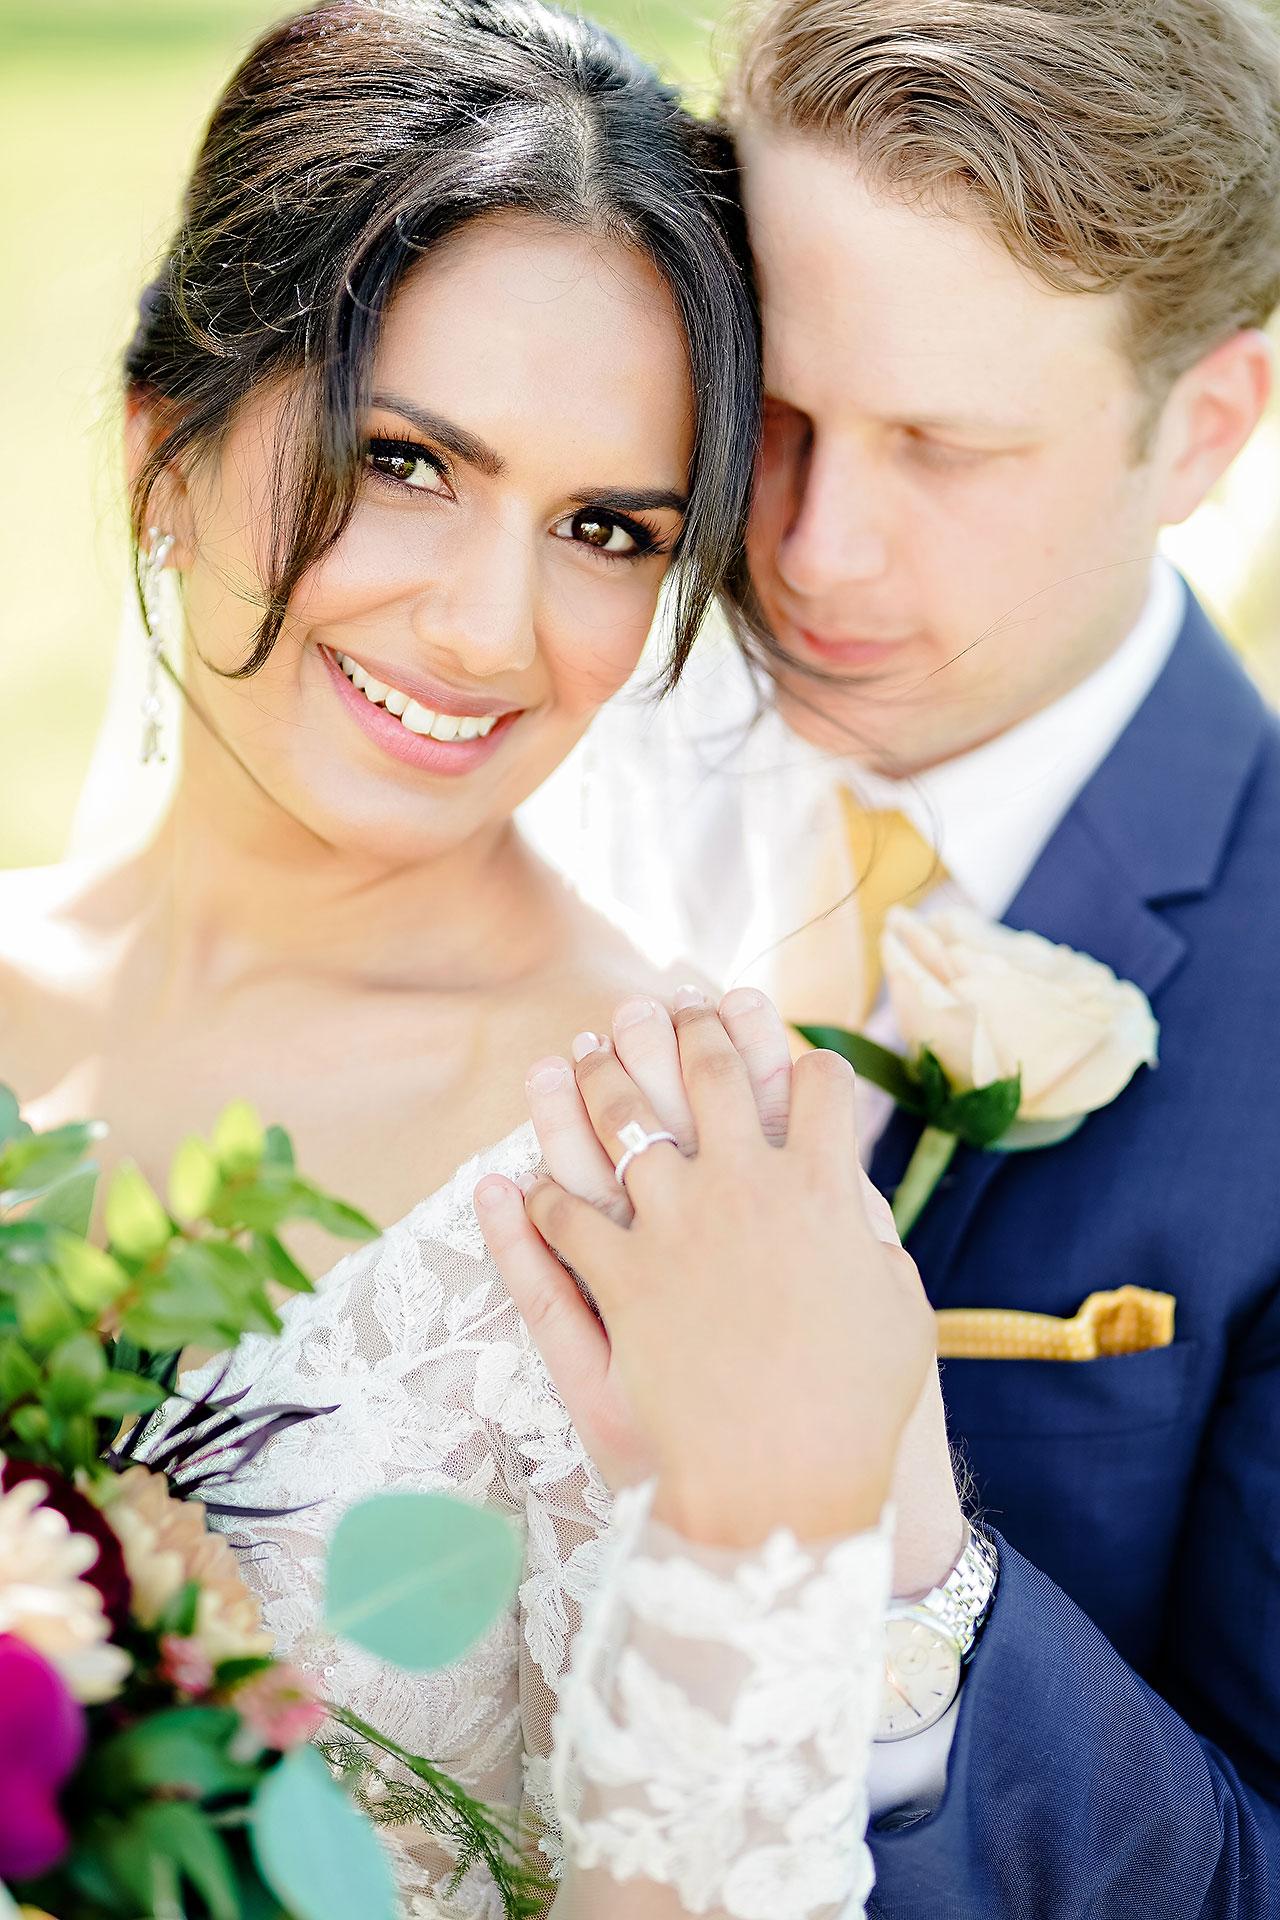 Nadia Parker Black Iris Estate Carmel Indiana Wedding May 2021 099